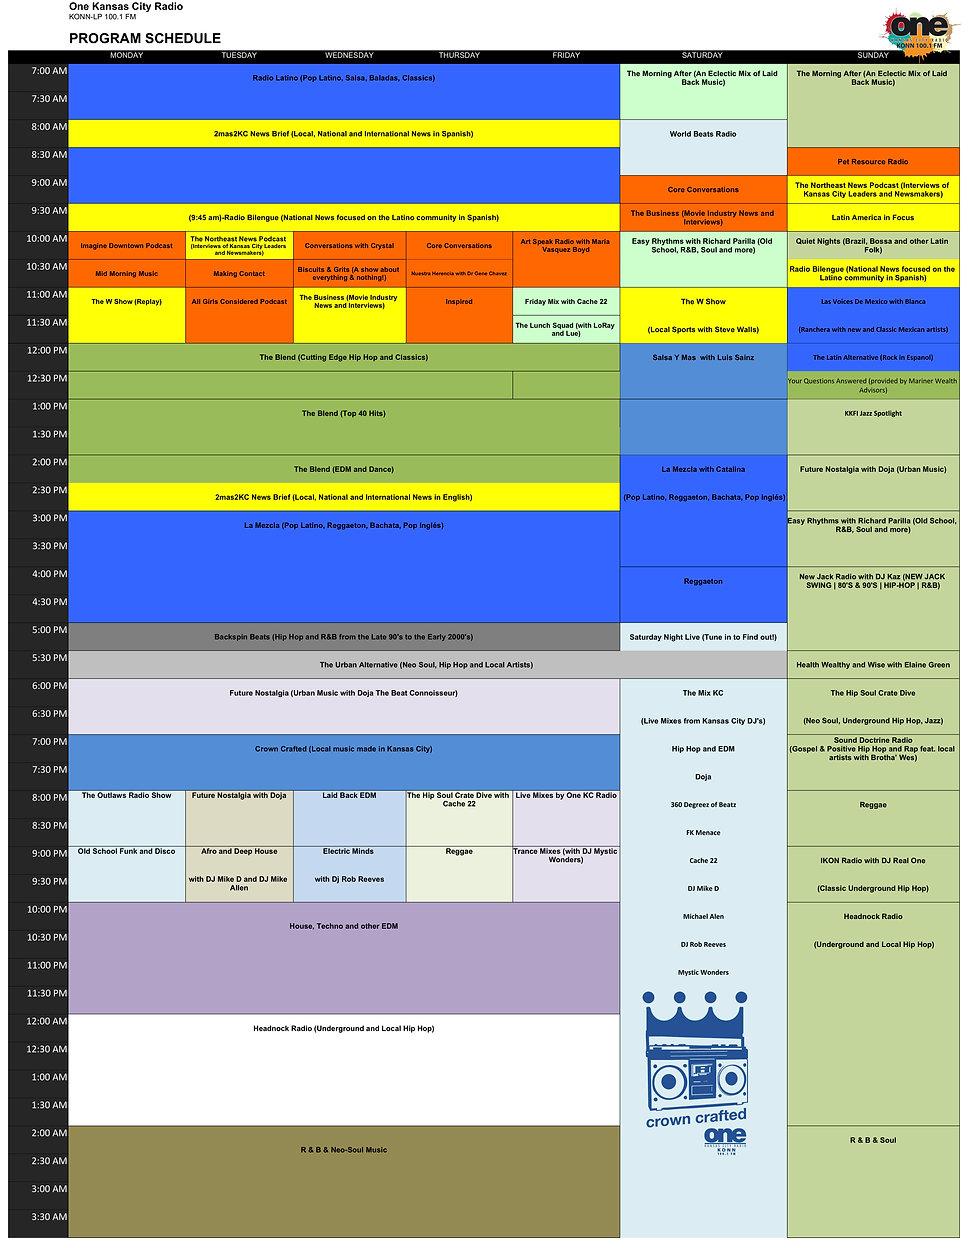 One Kansas City Program Schedule - Sheet